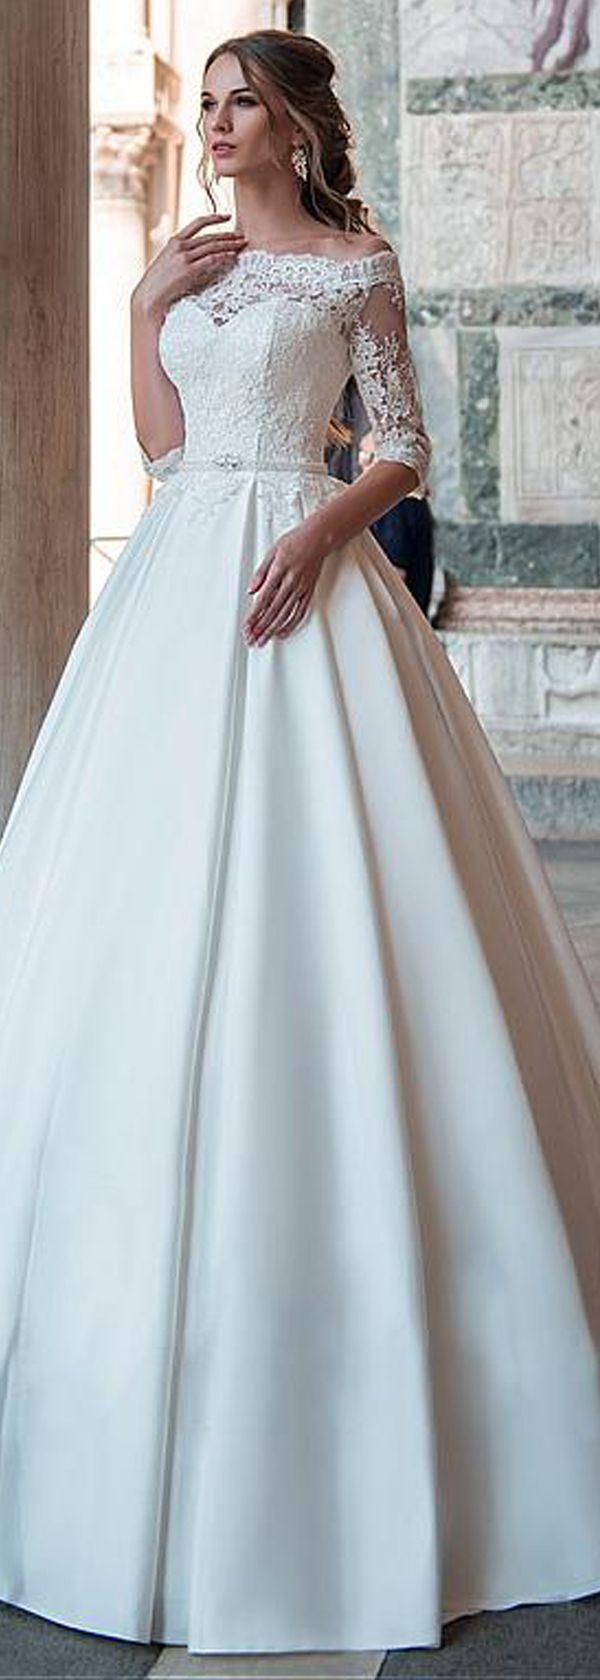 Types of Wedding Cakes for Theme Weddings | Vestidos de novia, De ...